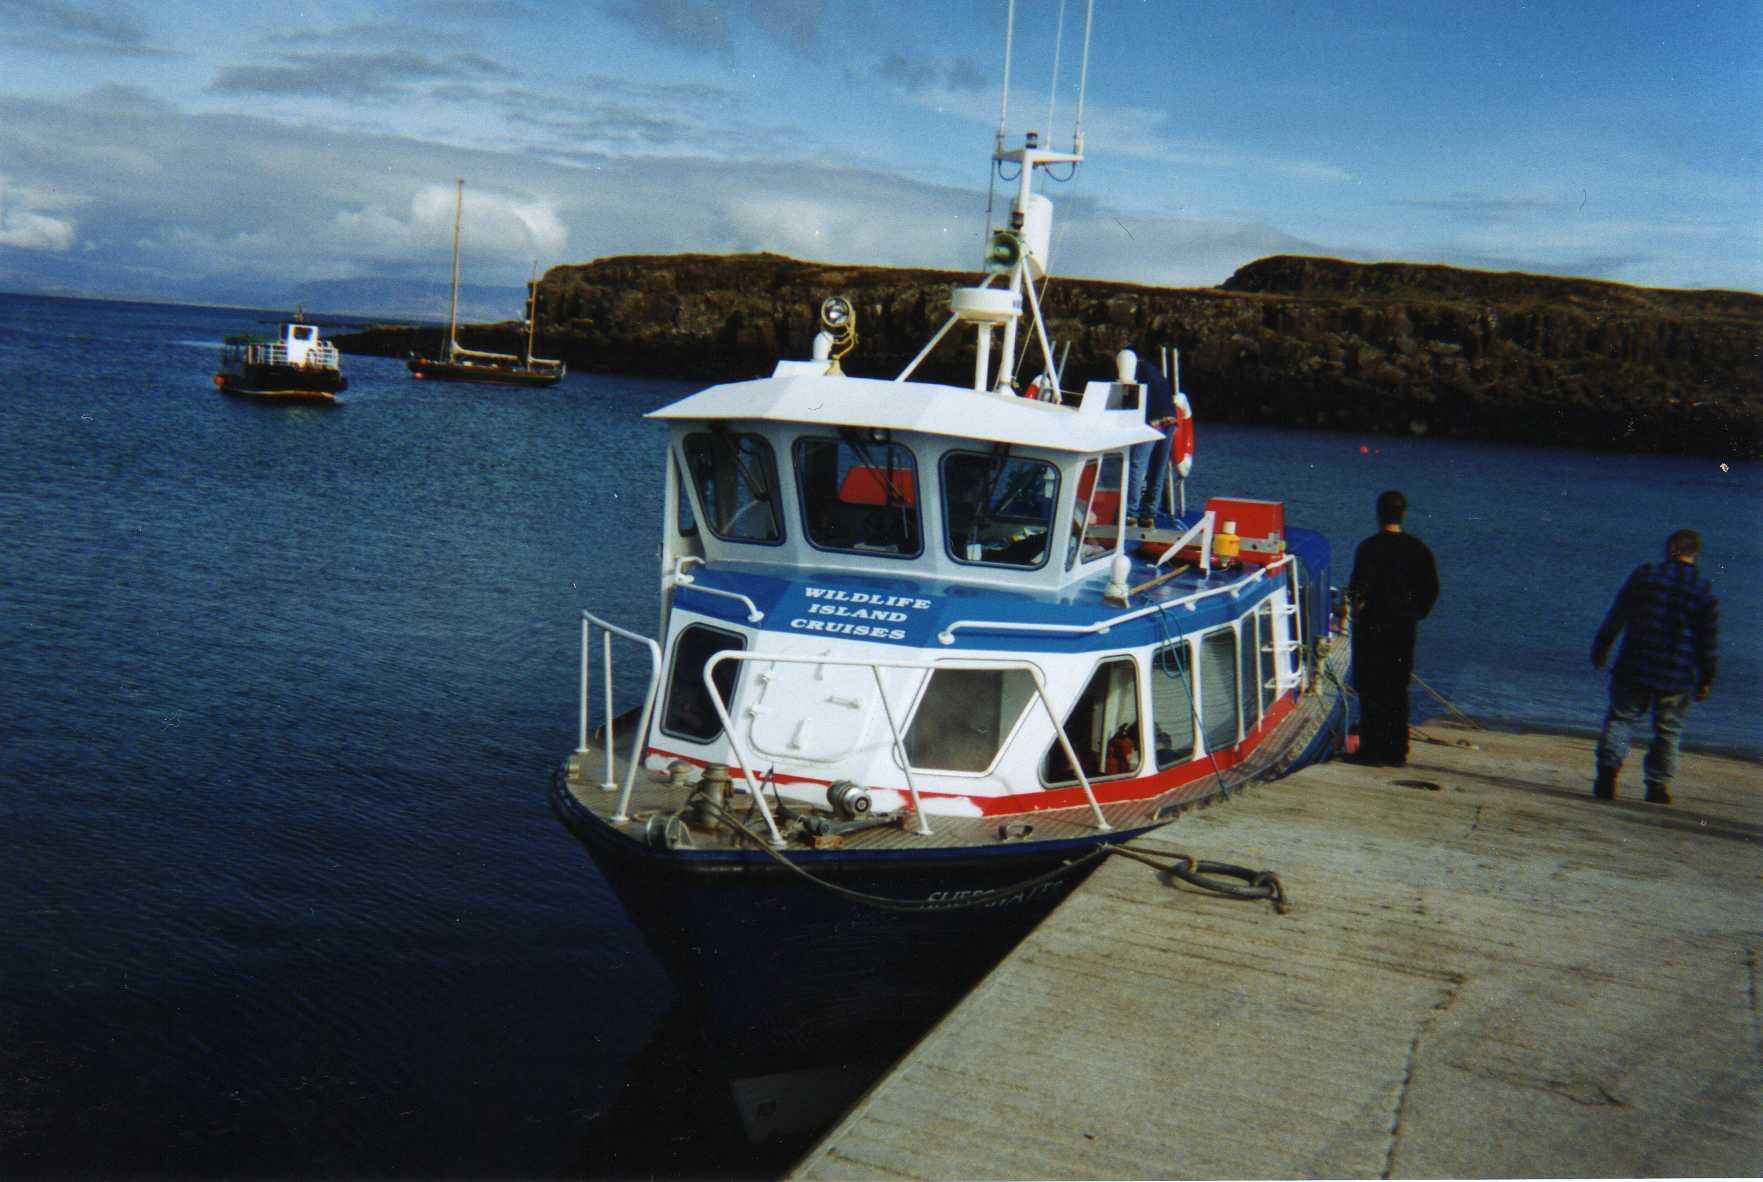 Seen behind Arisaig Marine's MV Sheerwater